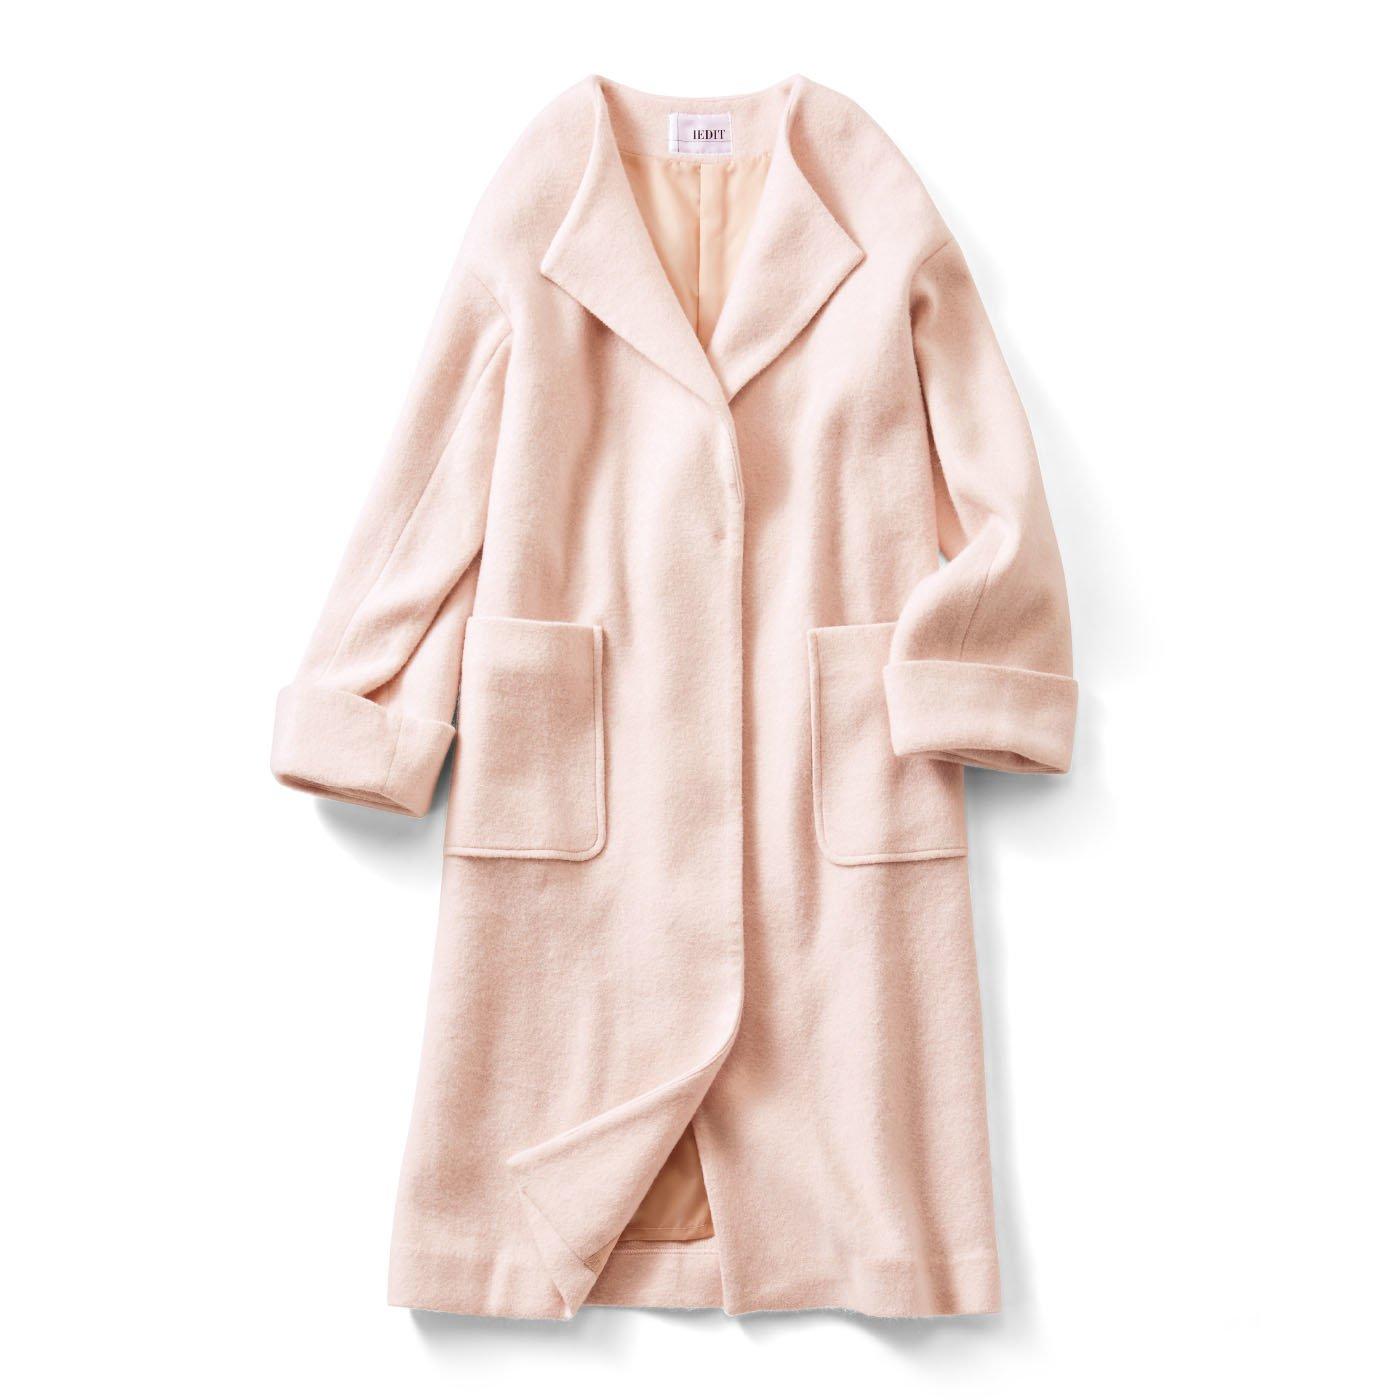 IEDIT 大人ピンクがコーデを格上げする フェミニンロングコート〈ペールピンク〉